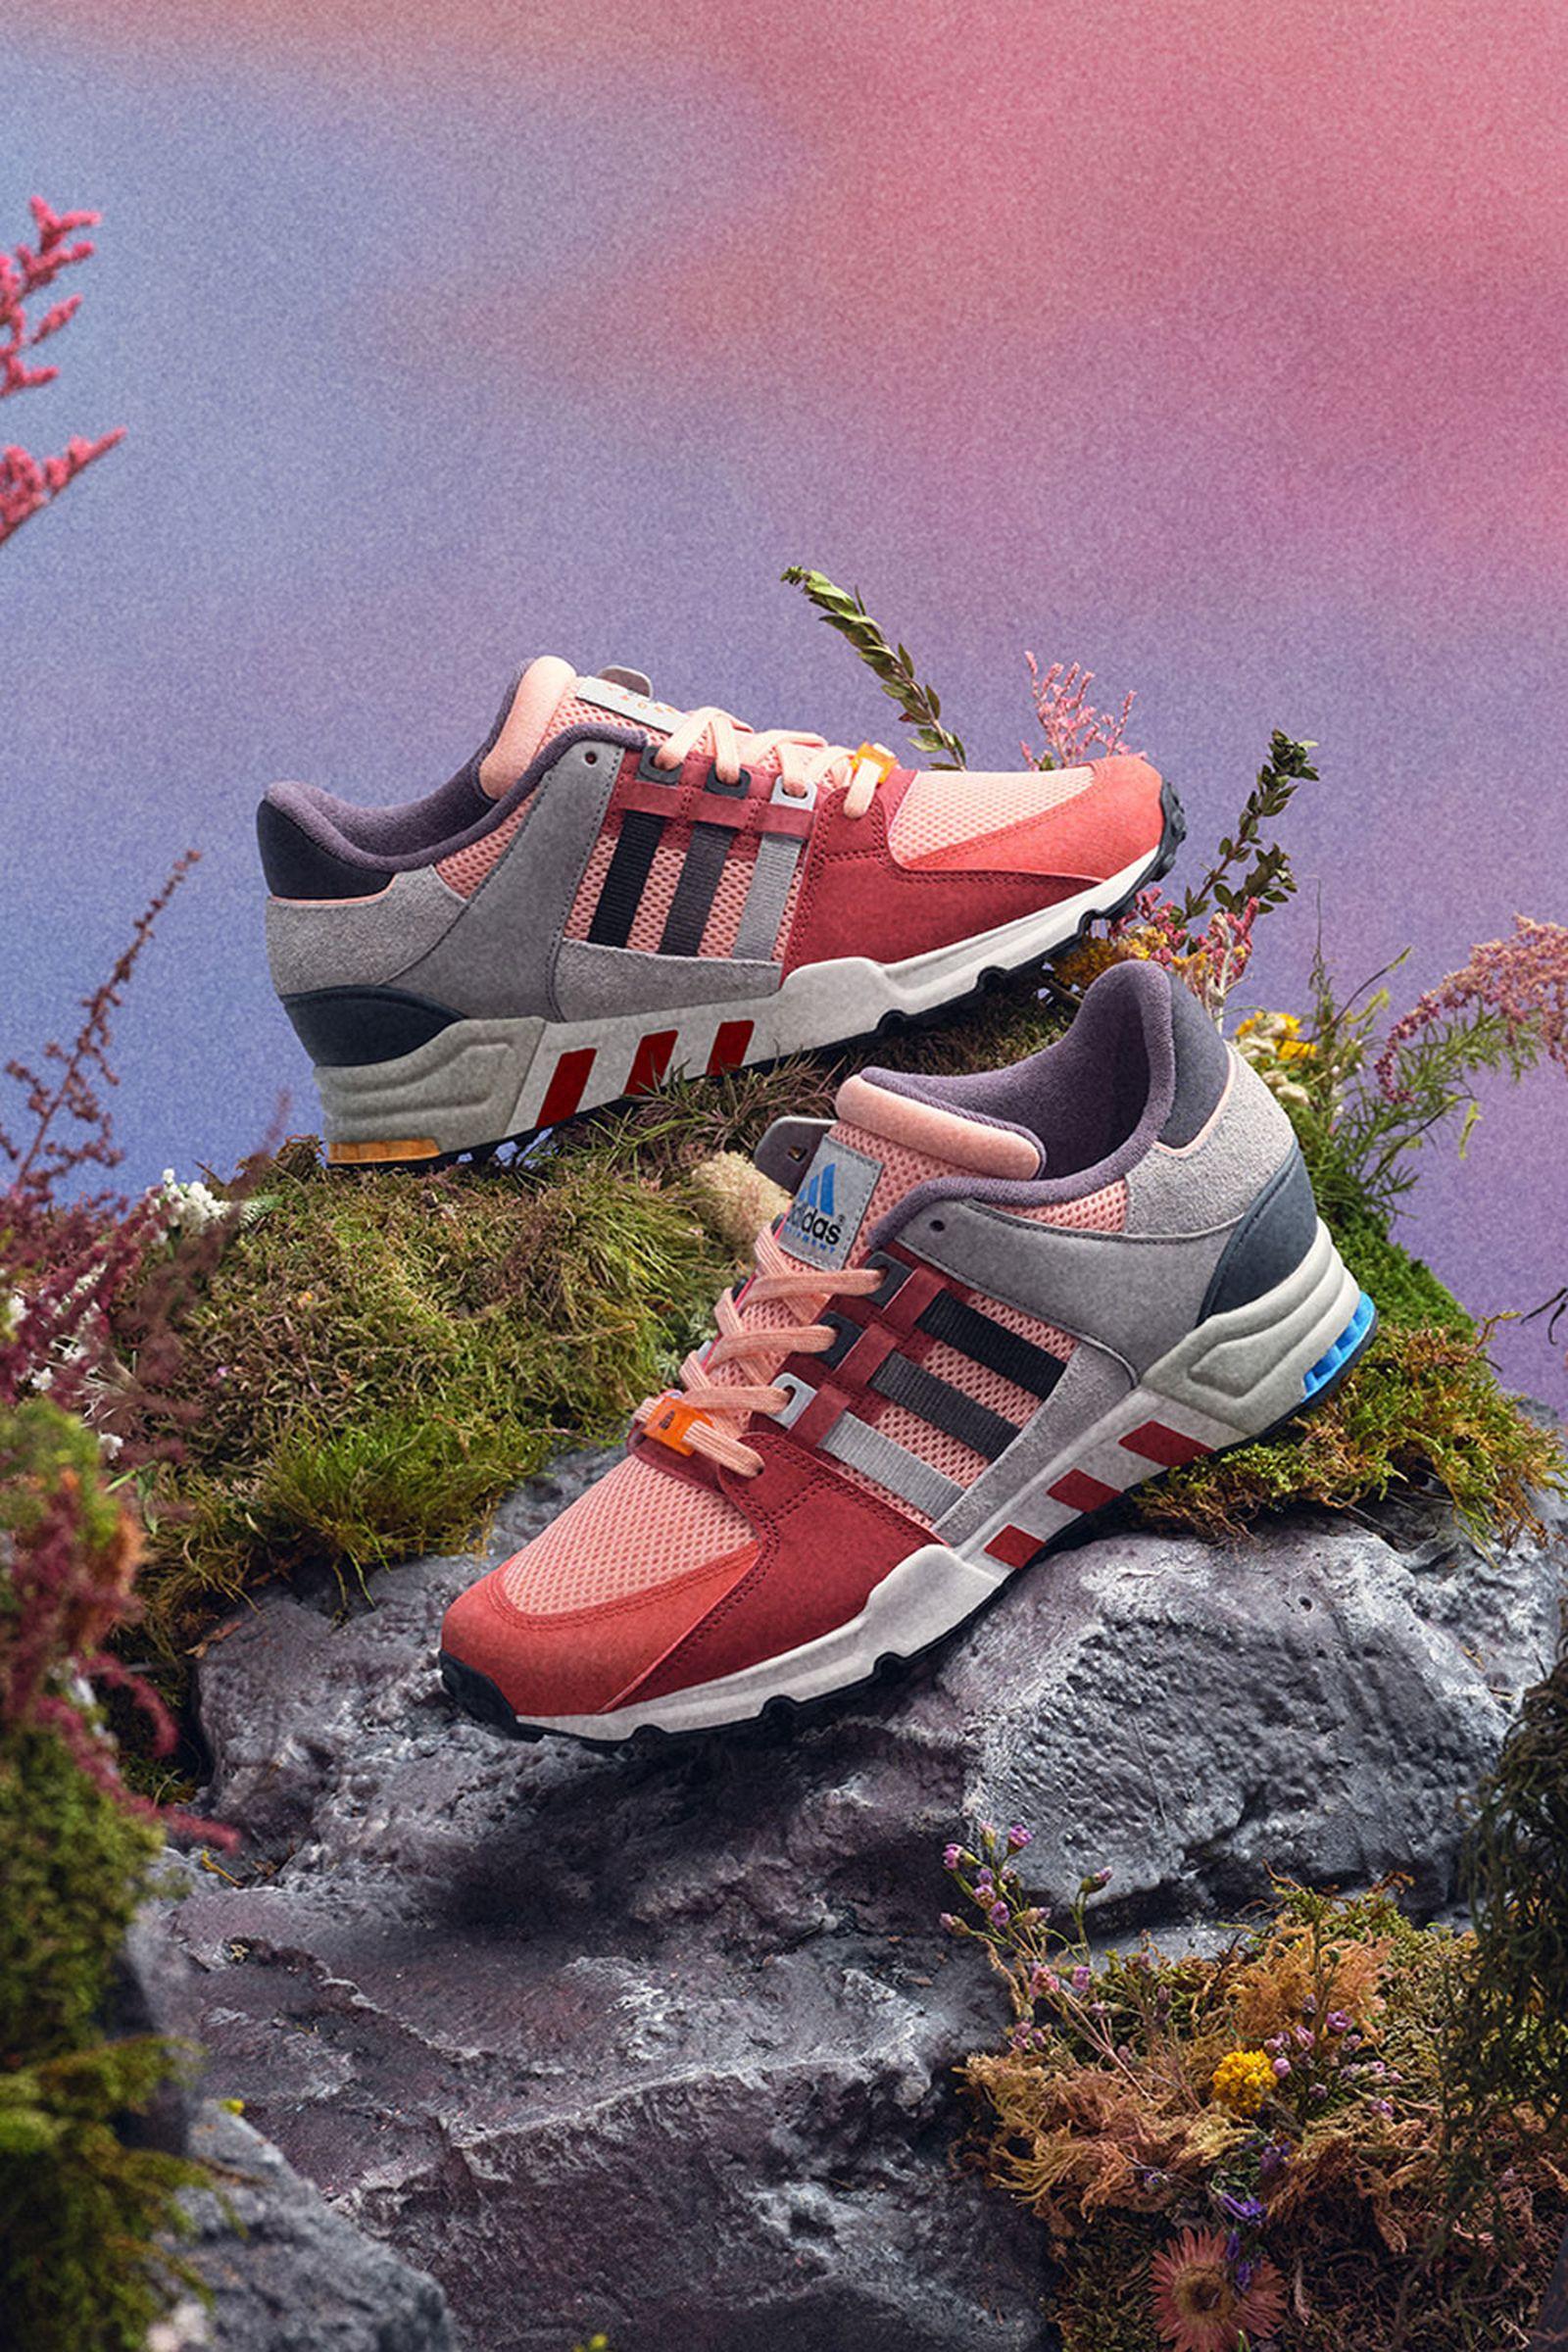 footpatrol-x-adidas-eqt-running-support-93-release-info-01